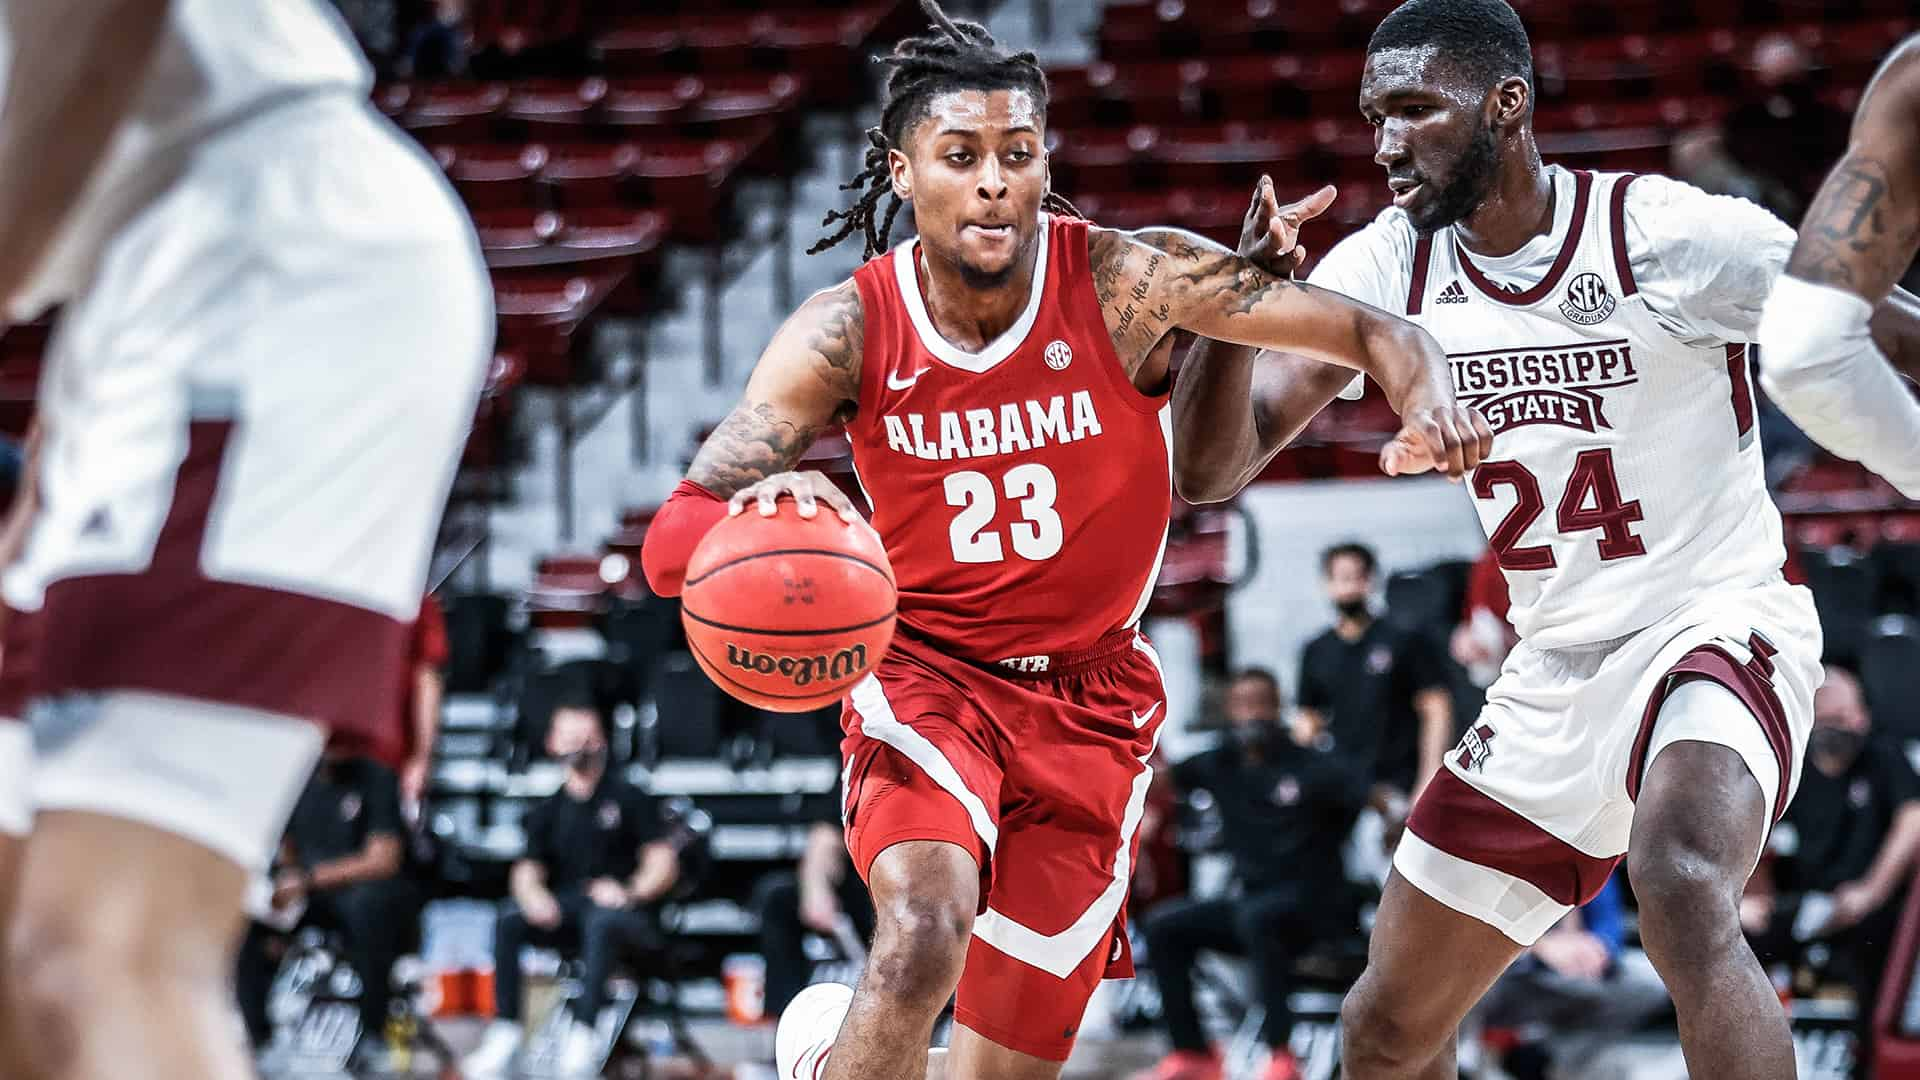 BasketballNcaa - Alabama Crimson Tide